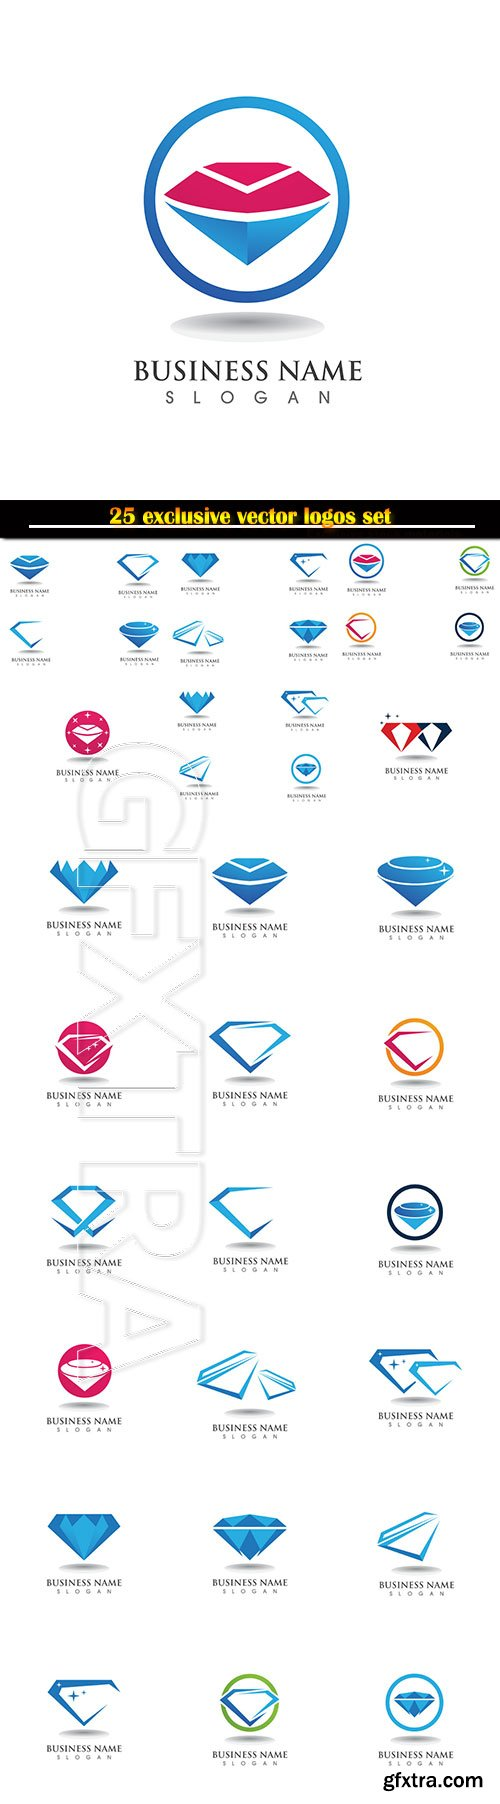 Logo business vector illustration template # 128